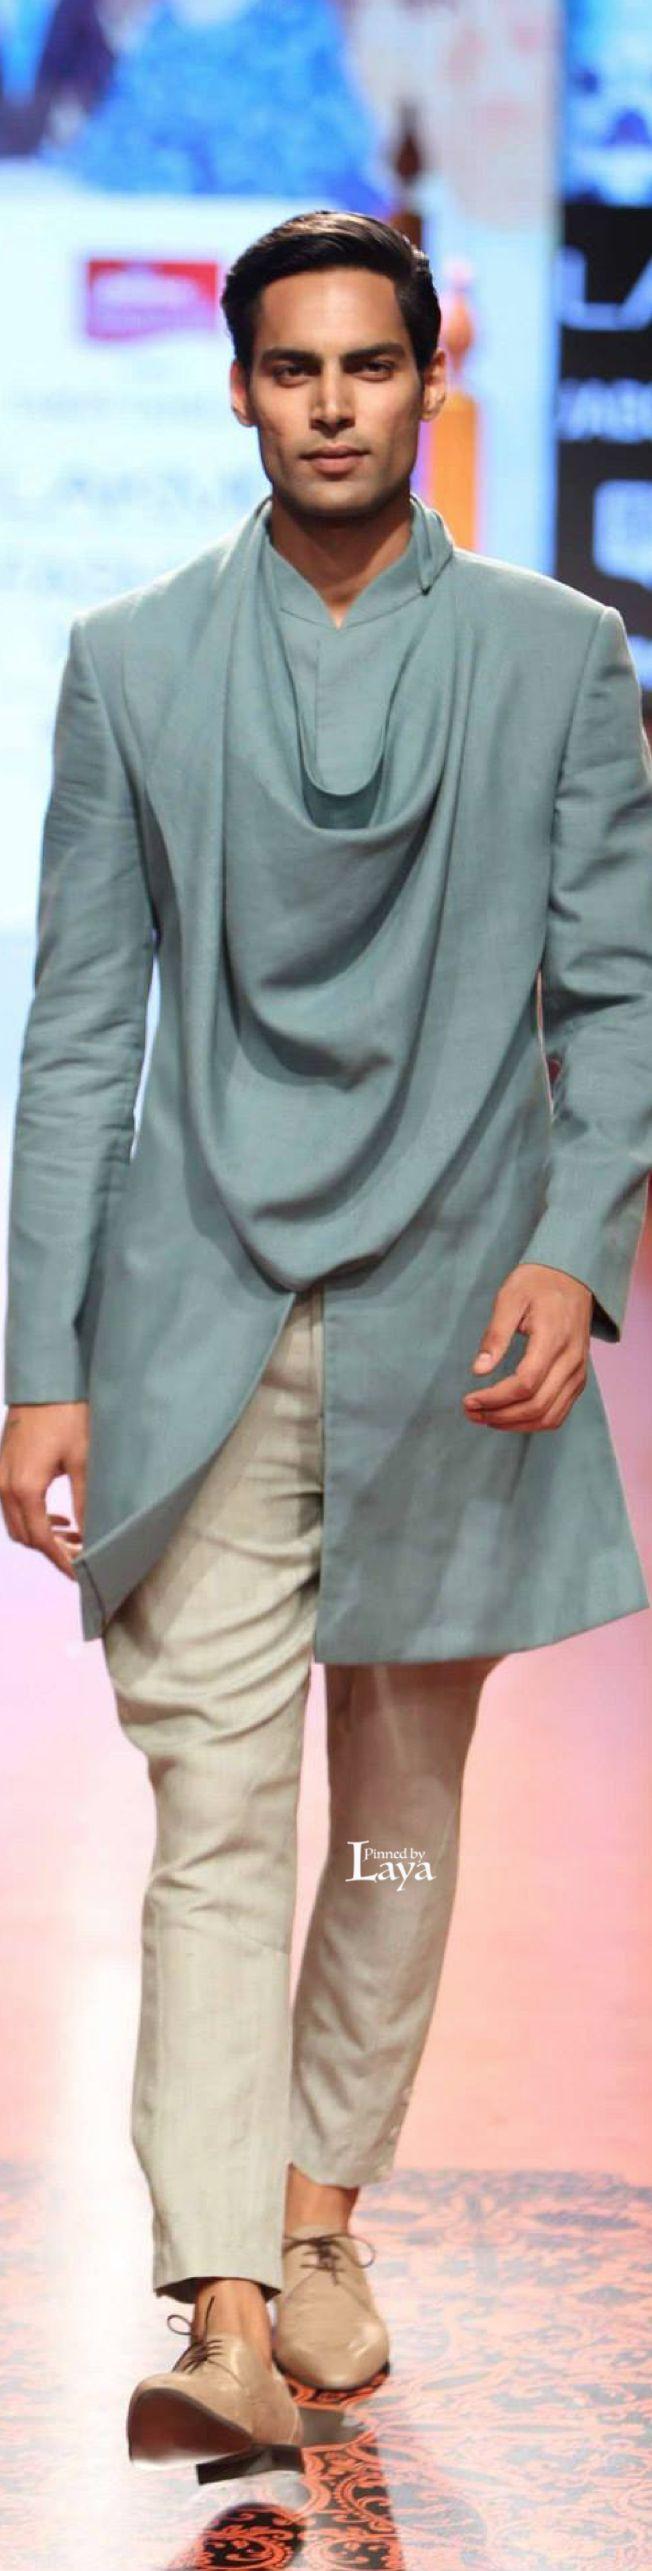 59 best Ethnic Wear for Men images on Pinterest | Moda masculina ...